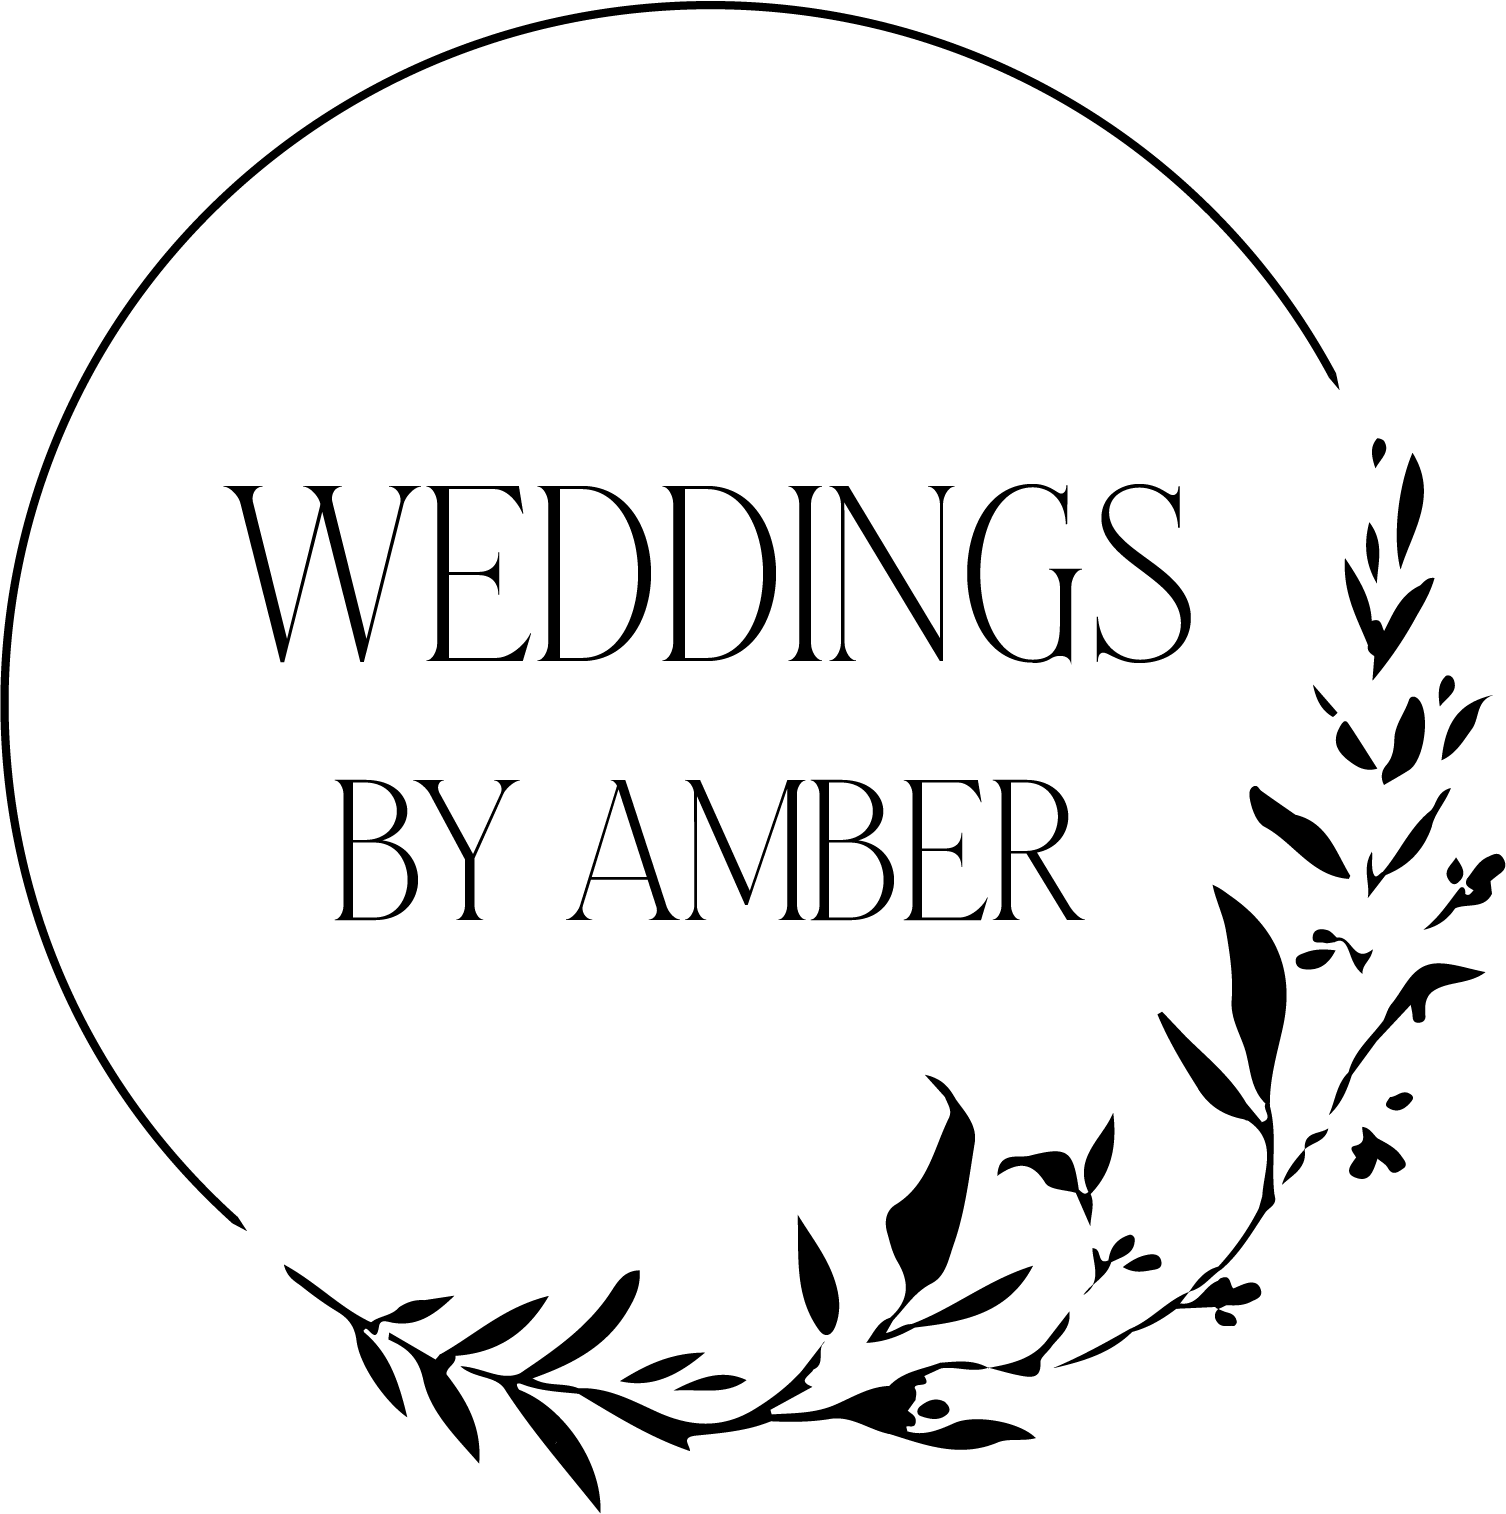 Weddings by Amber